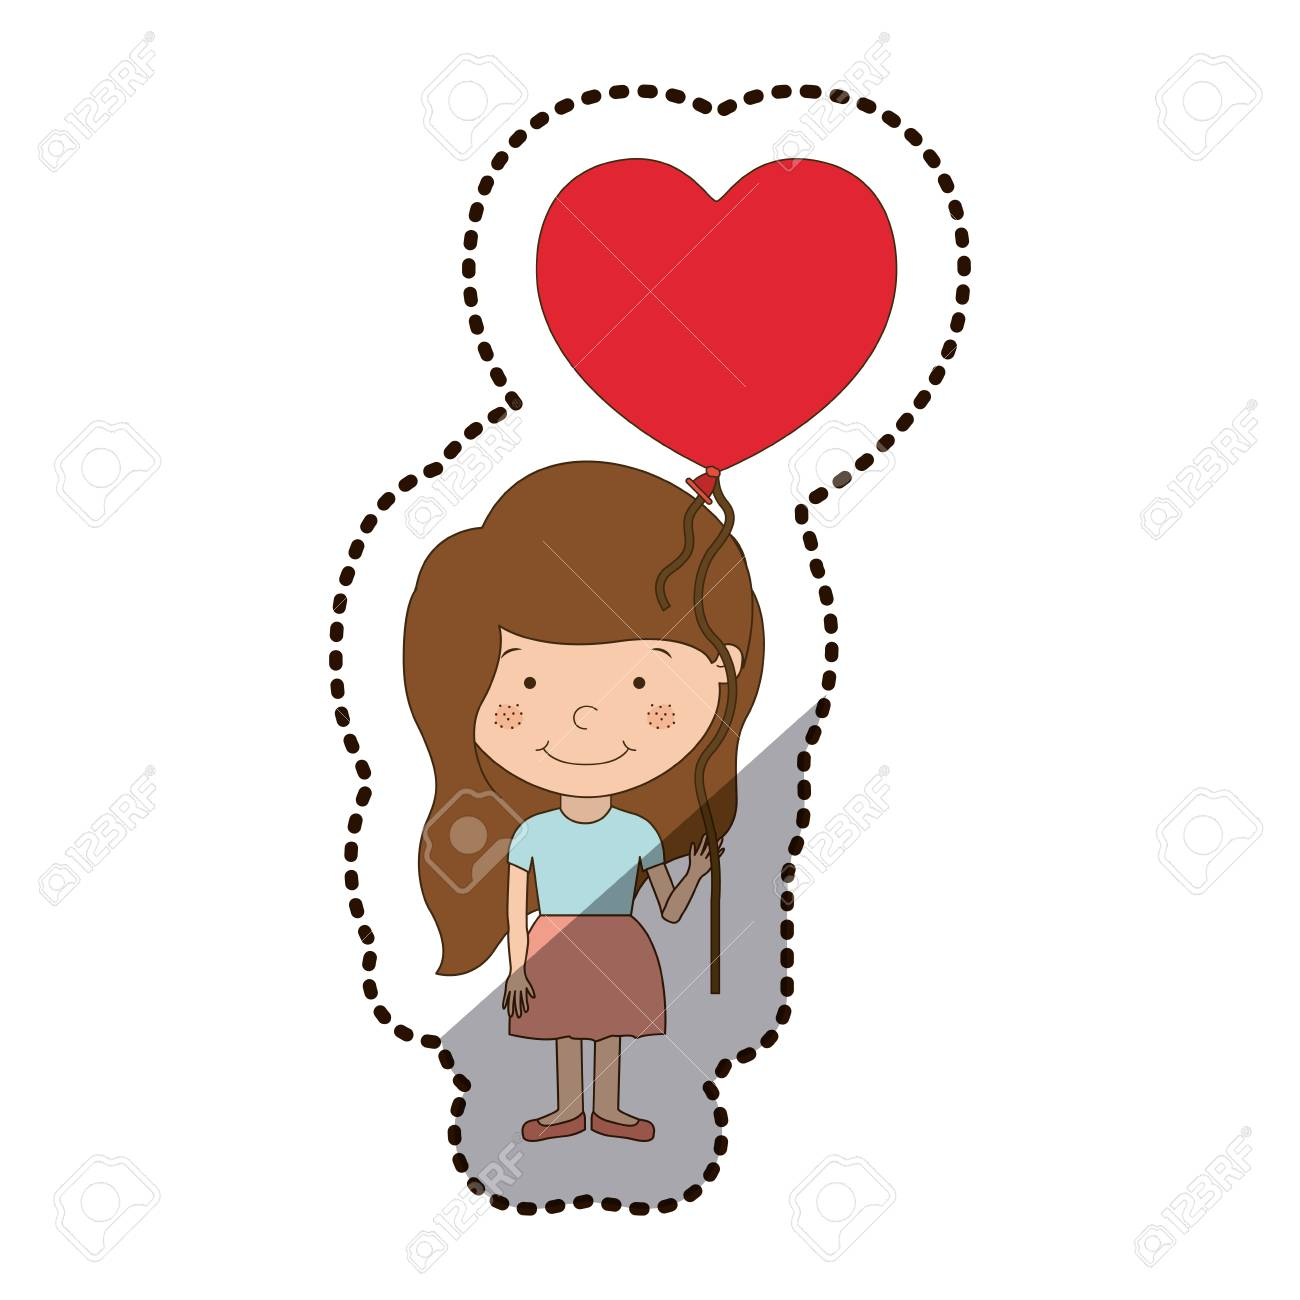 Girl Cartoon With Heart Balloon Icon Kid Childhood Little People